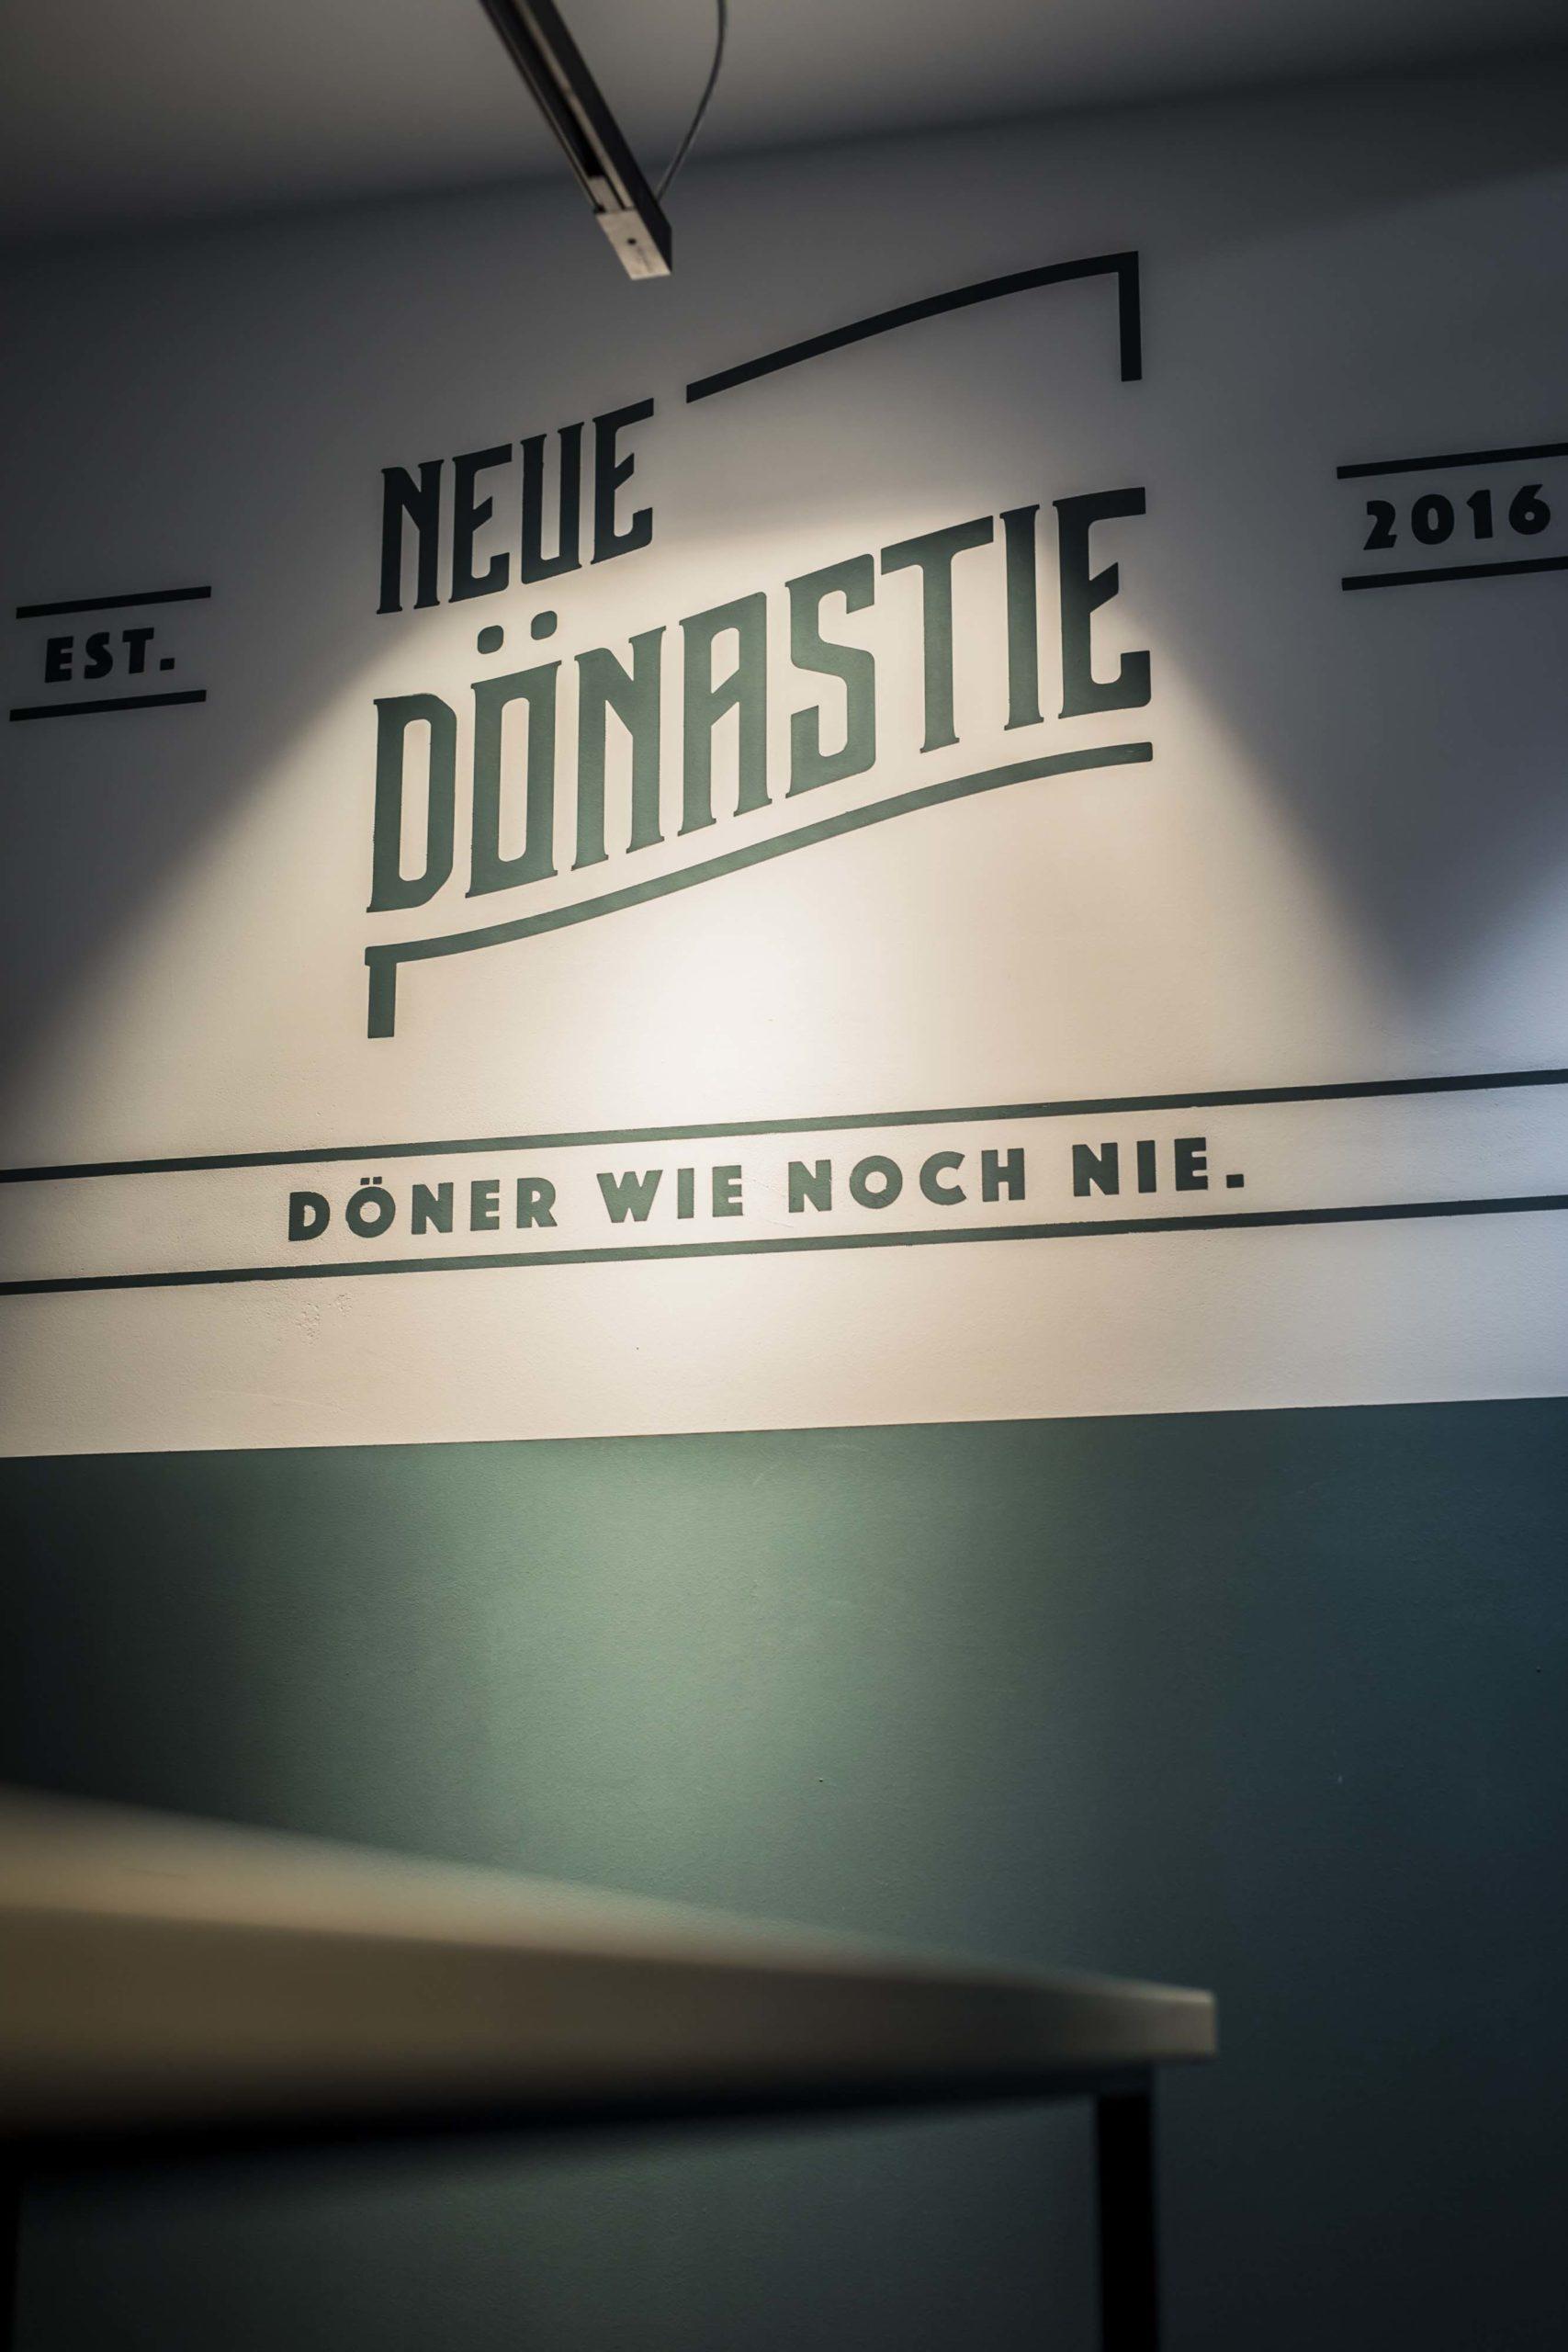 Wandschrift Neue Dönastie Stuttgart Nobla Raumgestaltung